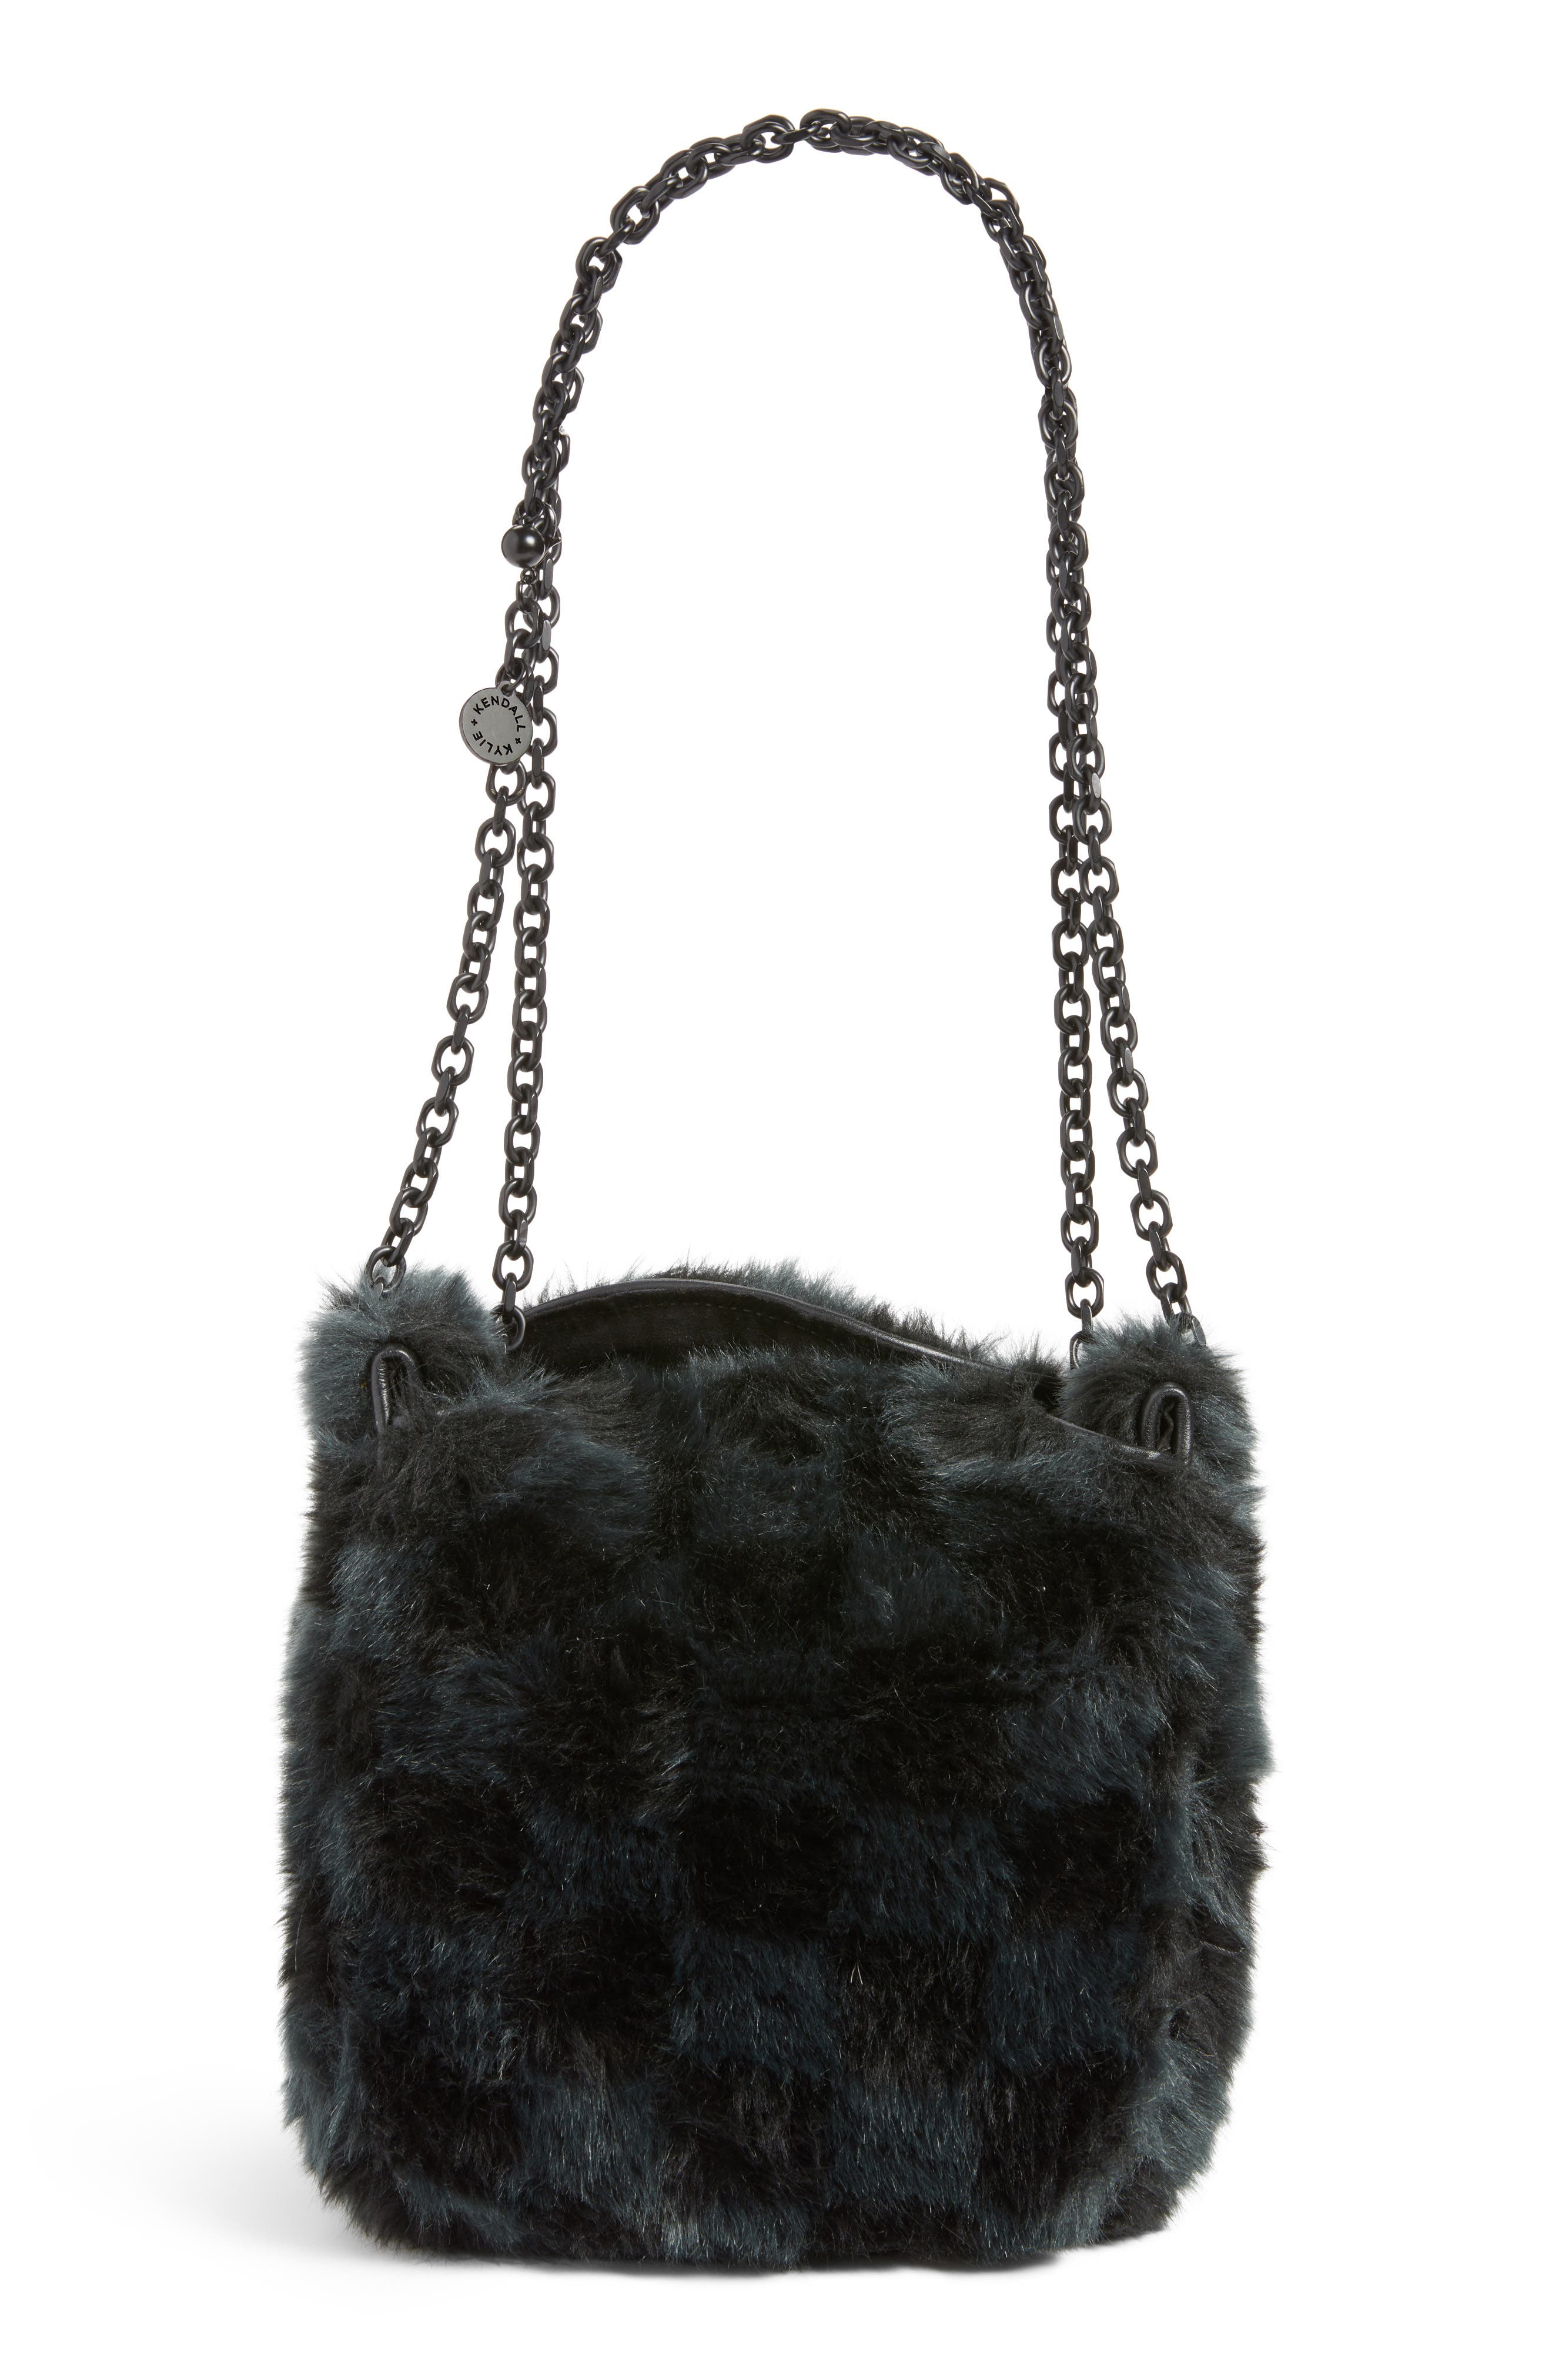 Alternate Image 1 Selected - KENDALL + KYLIE Faux Fur Bucket Bag